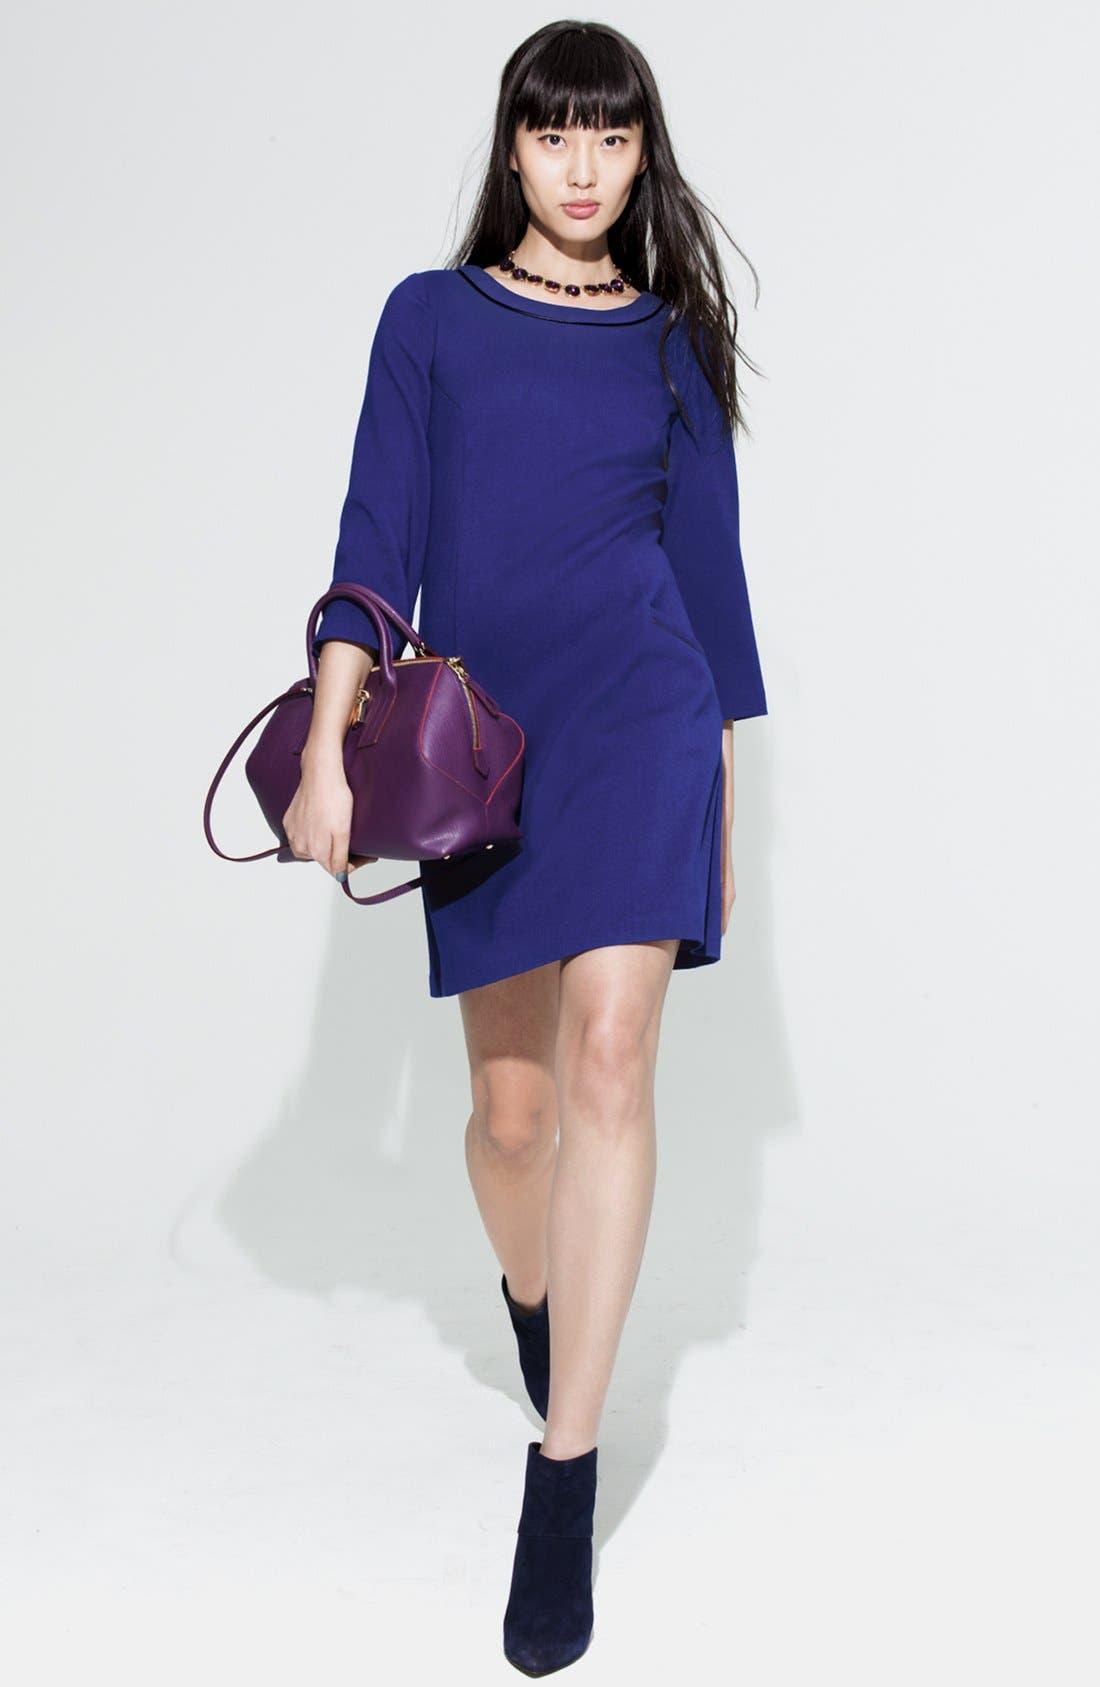 Alternate Image 1 Selected - Eliza J Shift Dress & Accessories